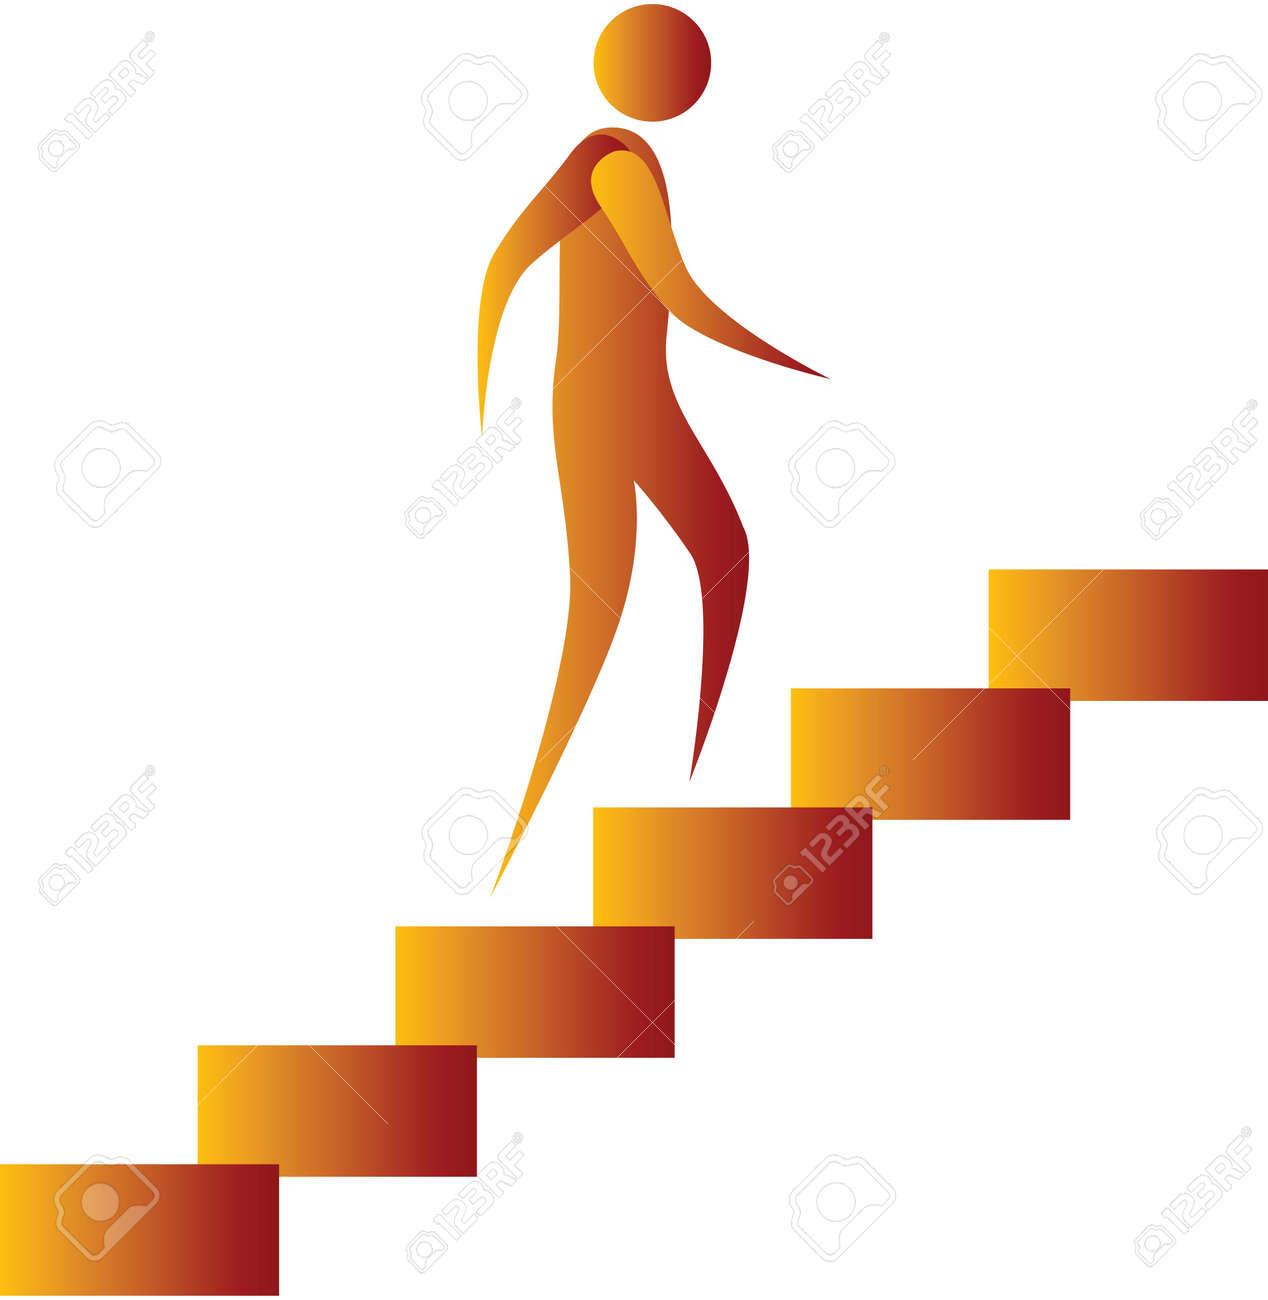 human climbing the stairs Stock Photo - 7596953